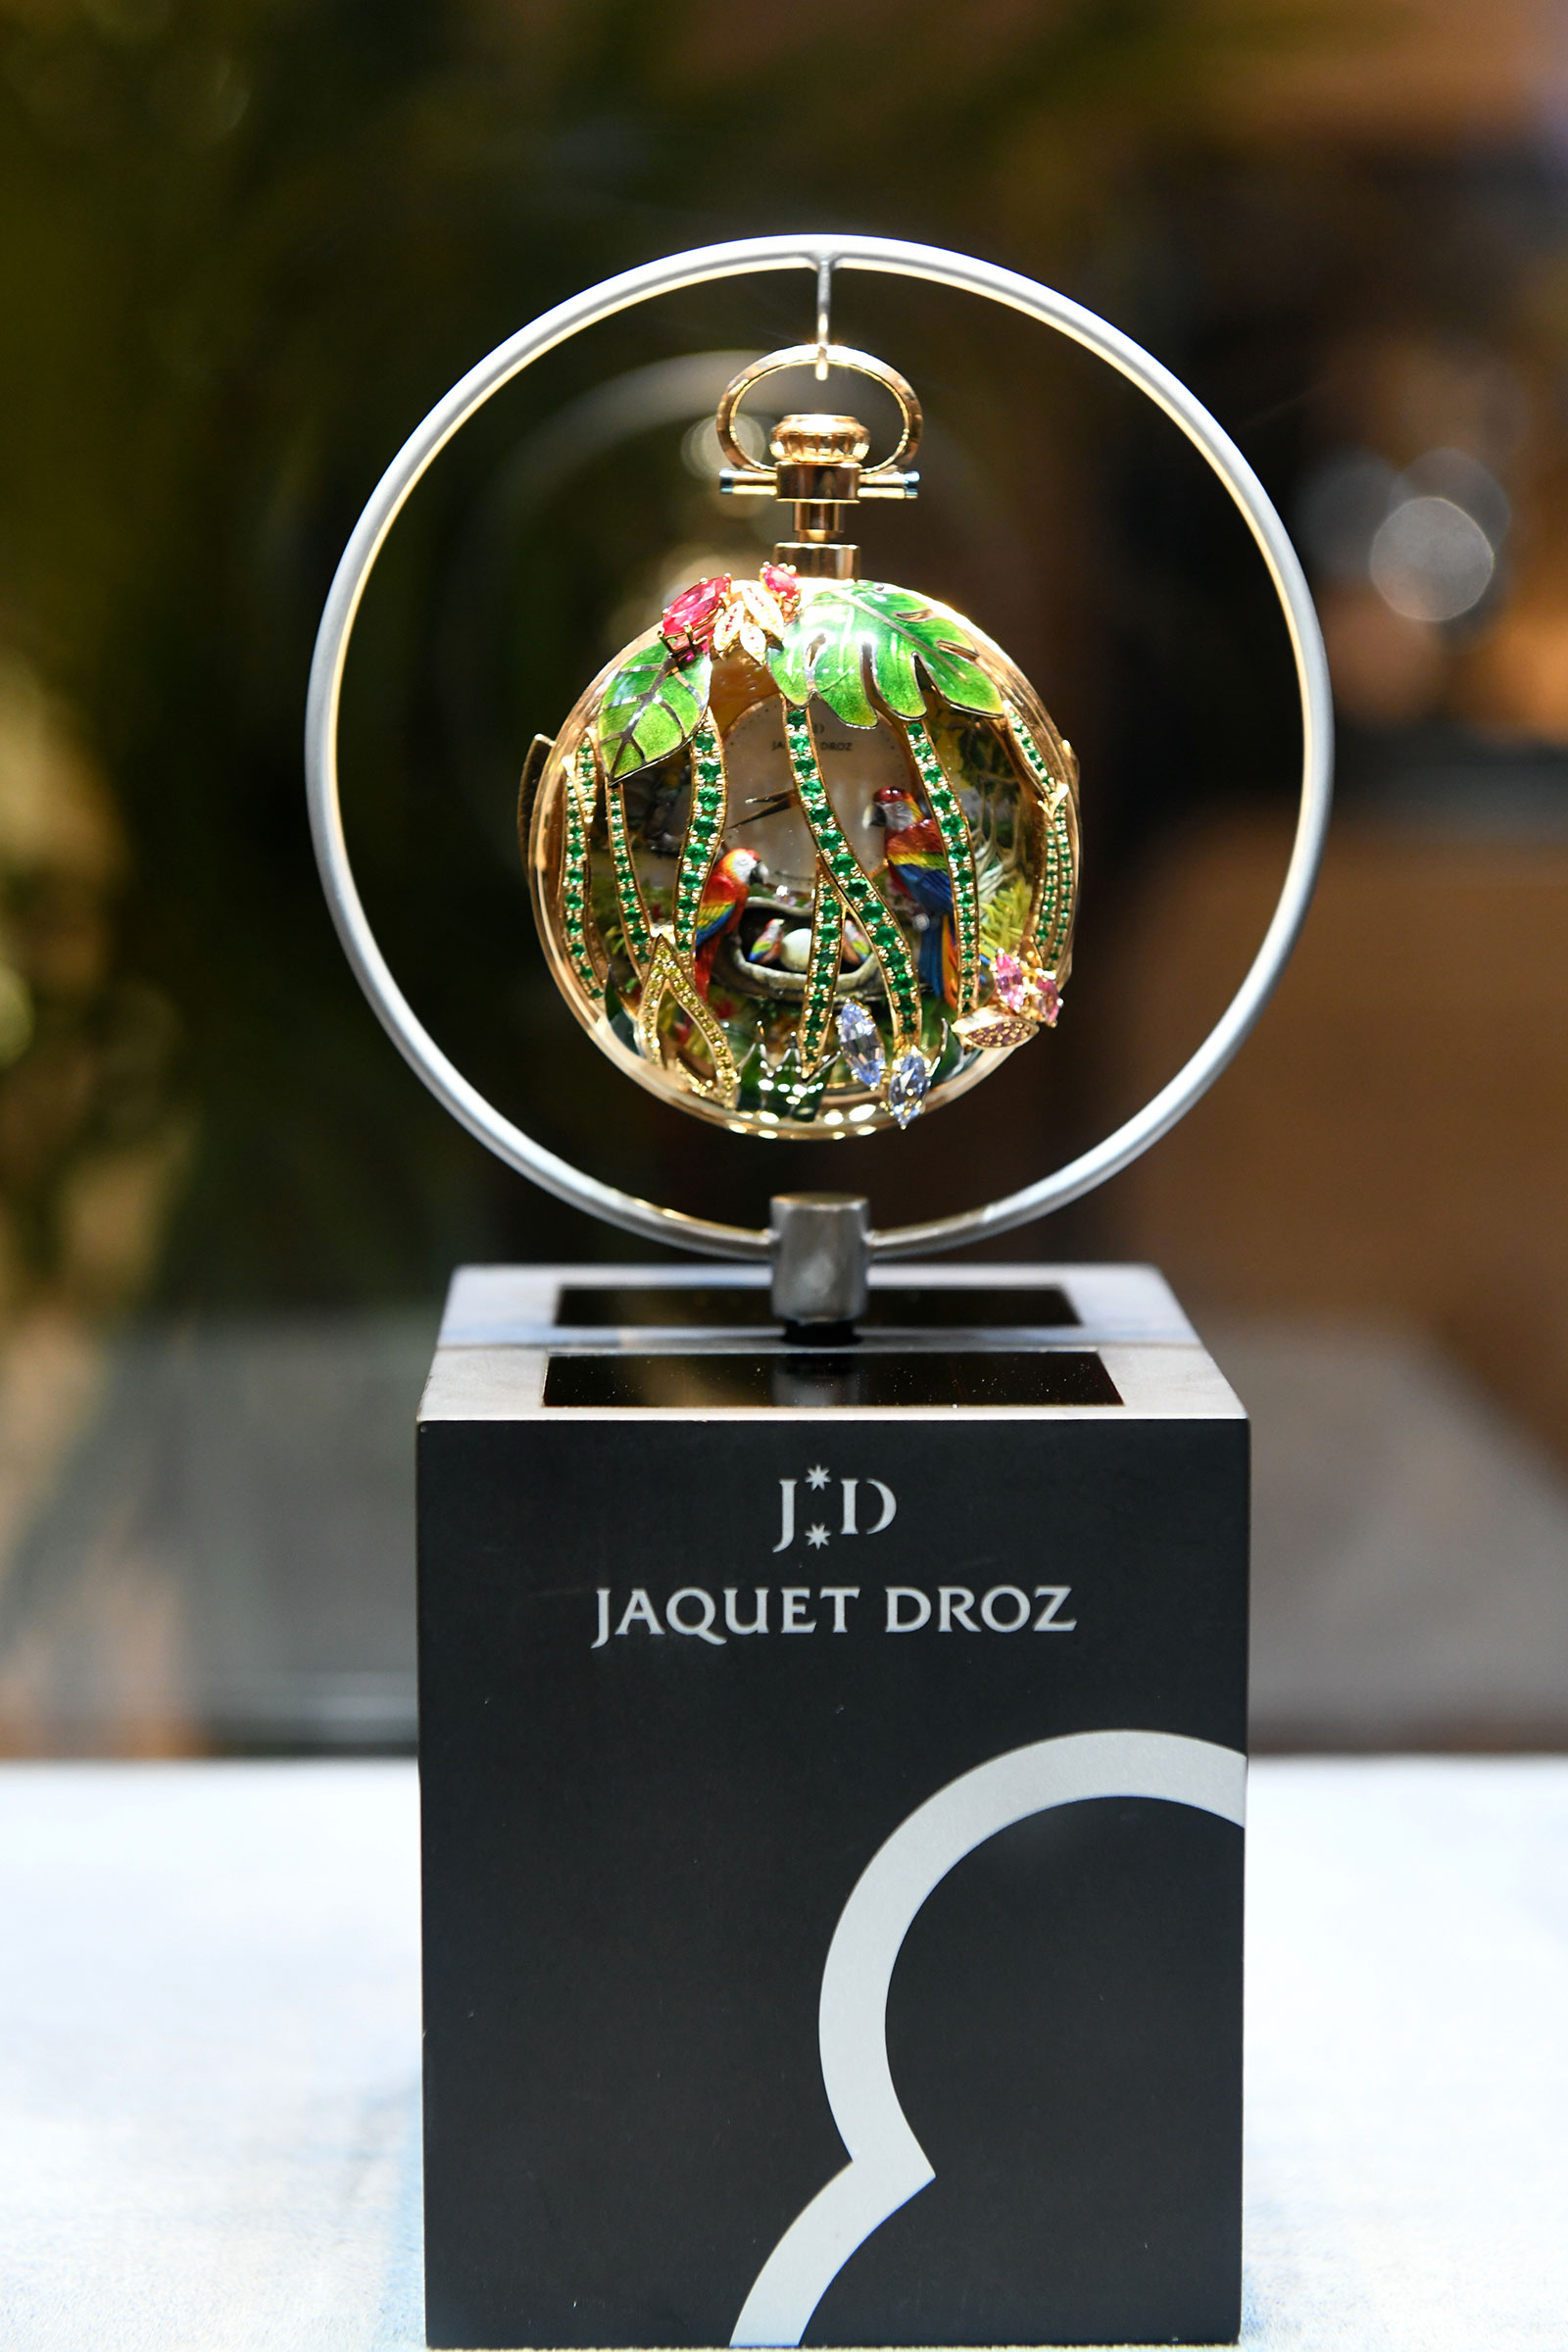 Jaquet Droz Parrot Repeater Watch Singapore 1